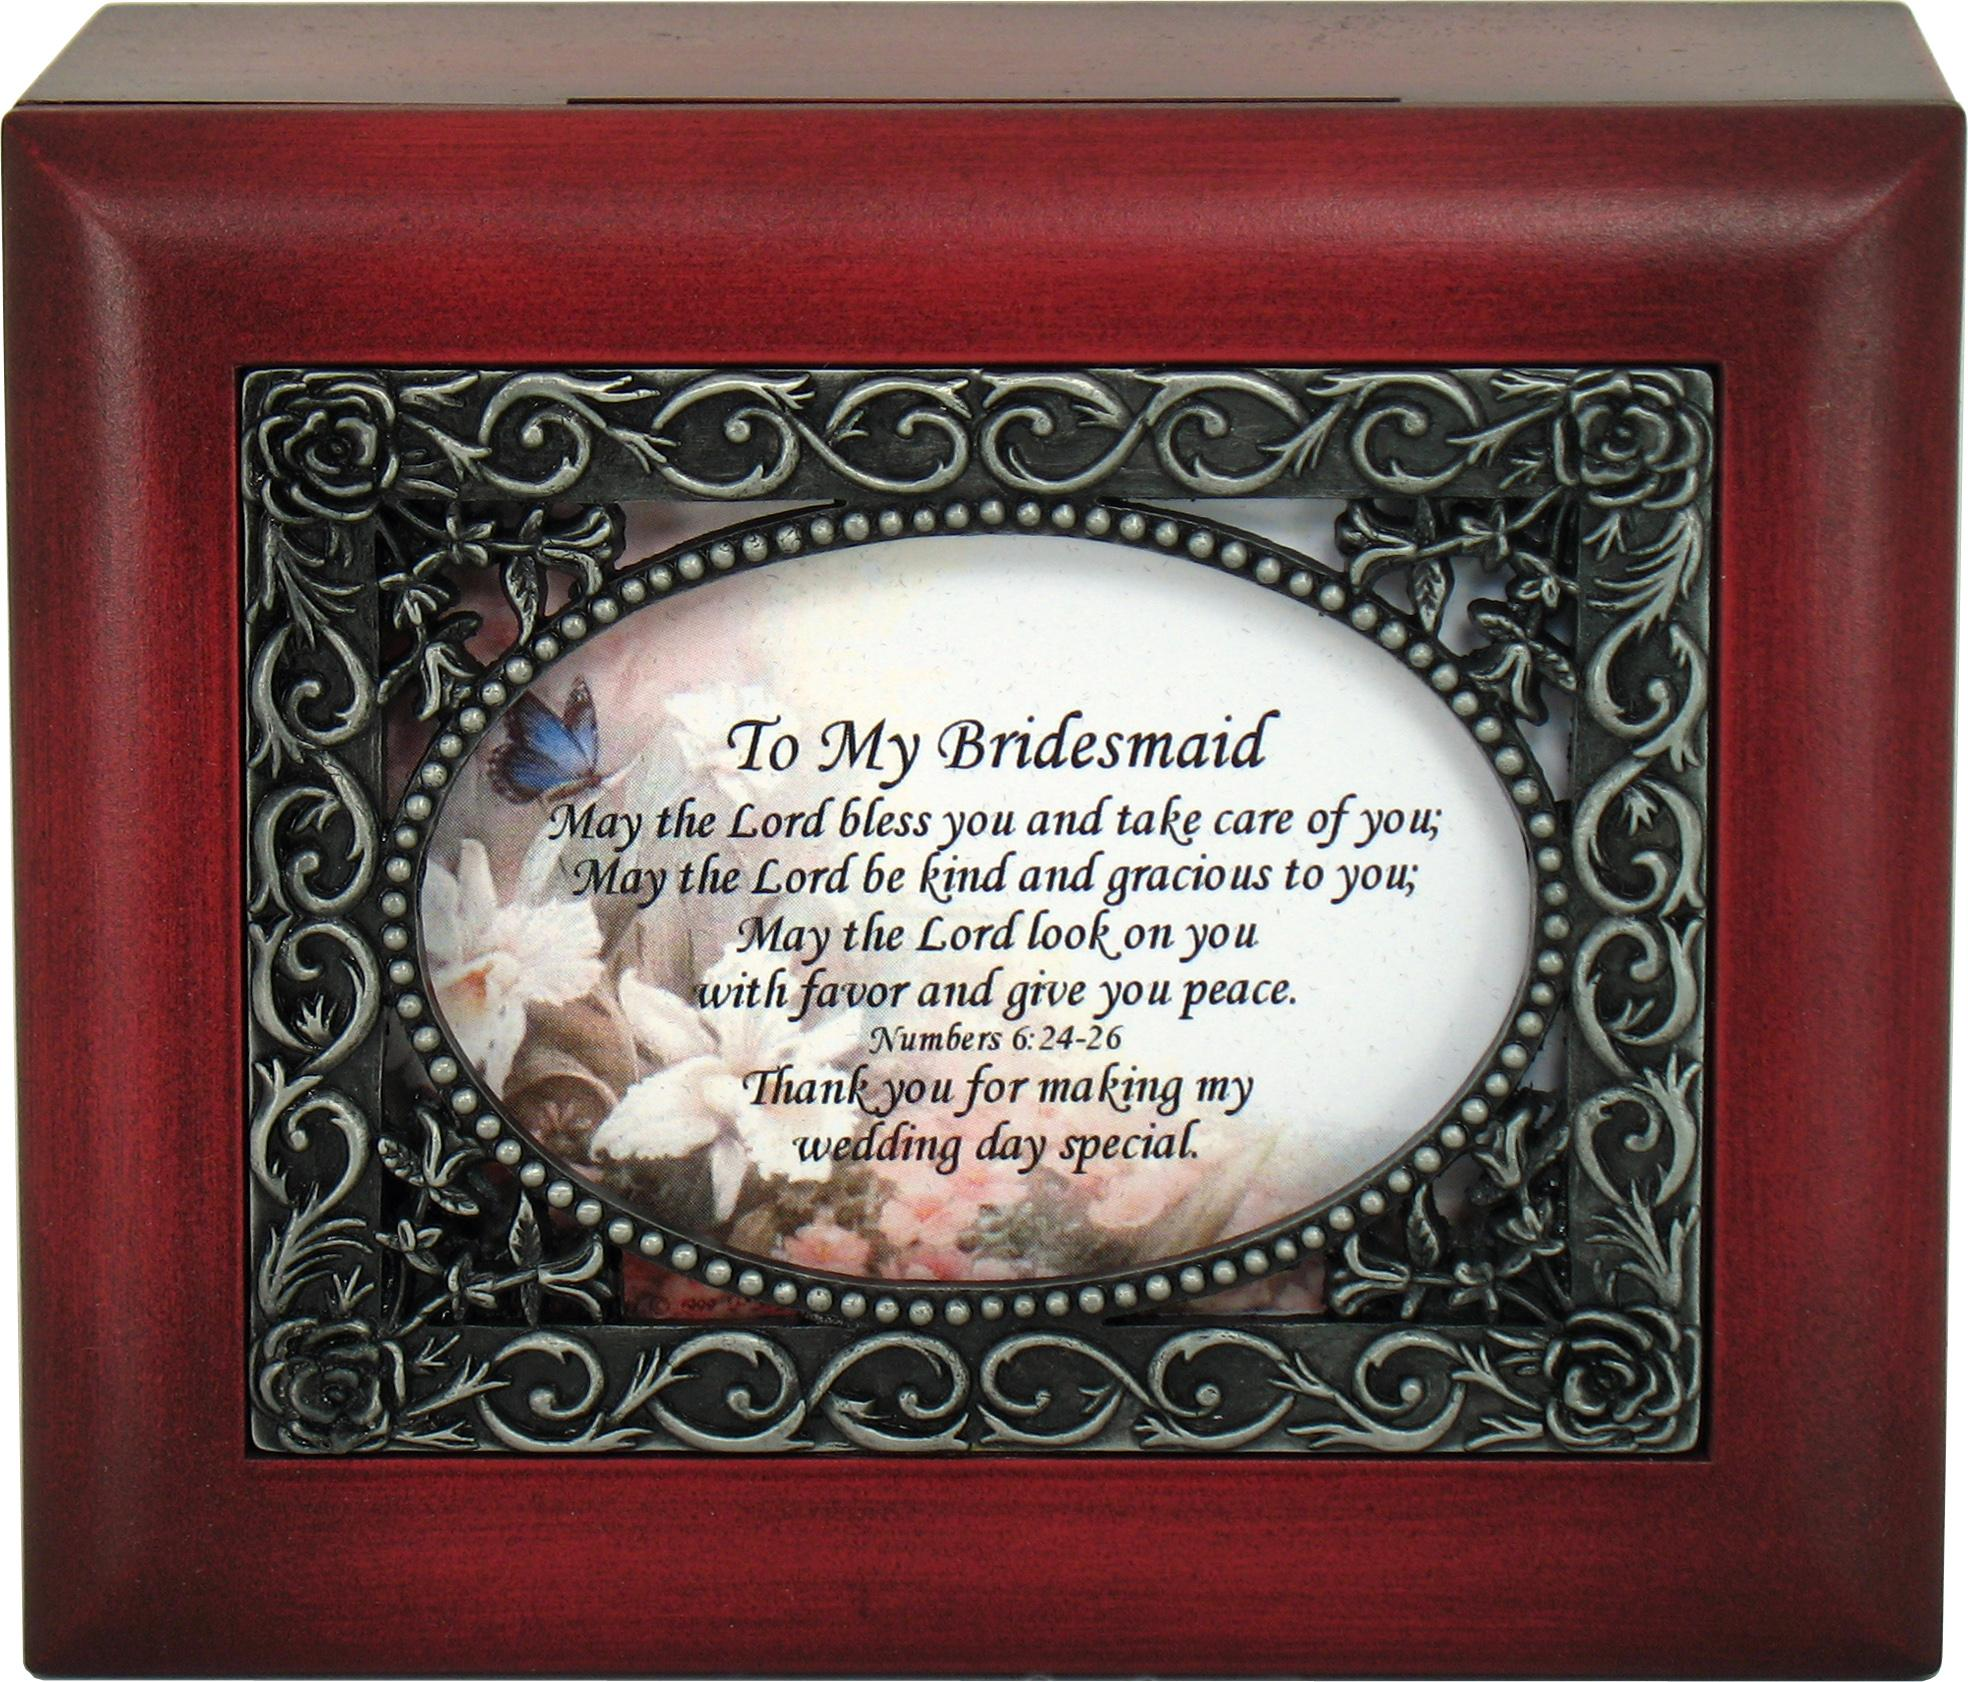 Bridesmaid Keepsake Box #SJBX-BM